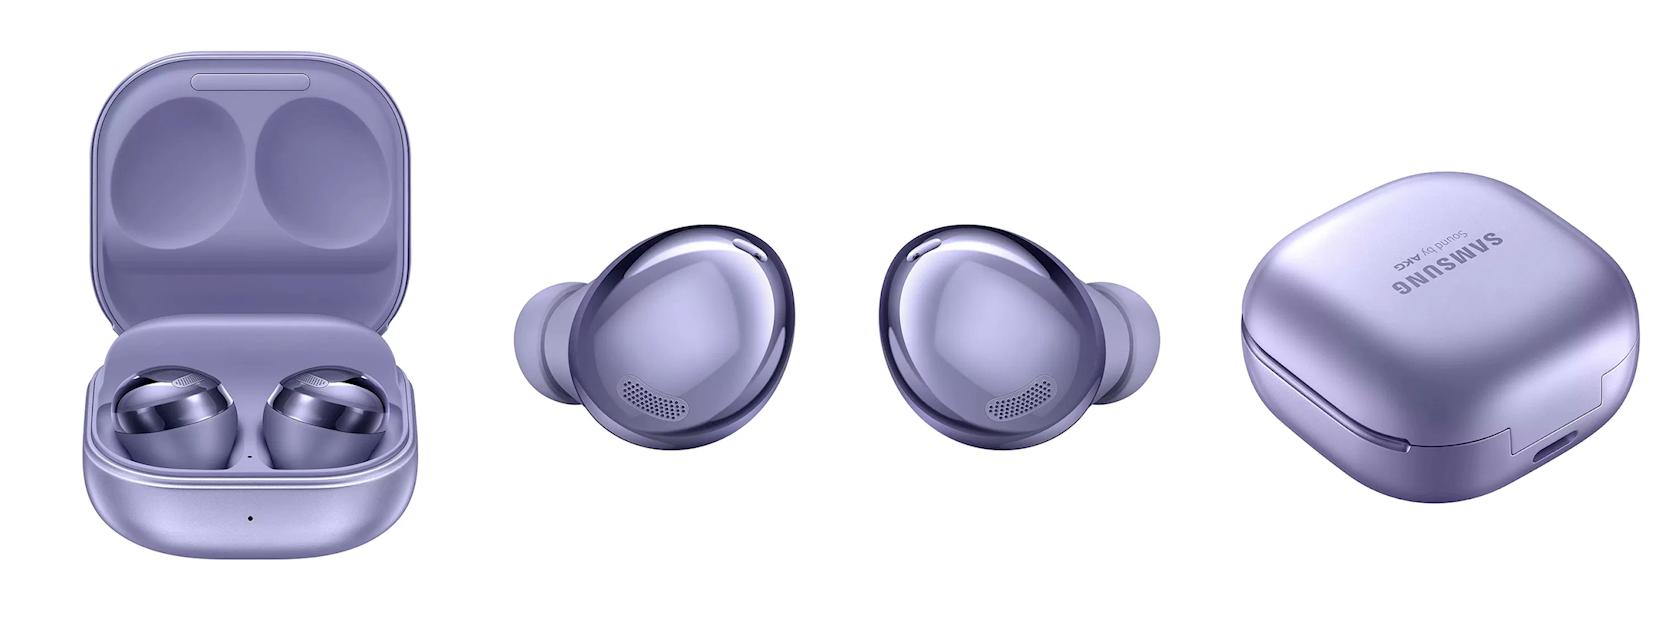 Simsiz qulaqlıqlar Samsung Galaxy Buds Pro Violet